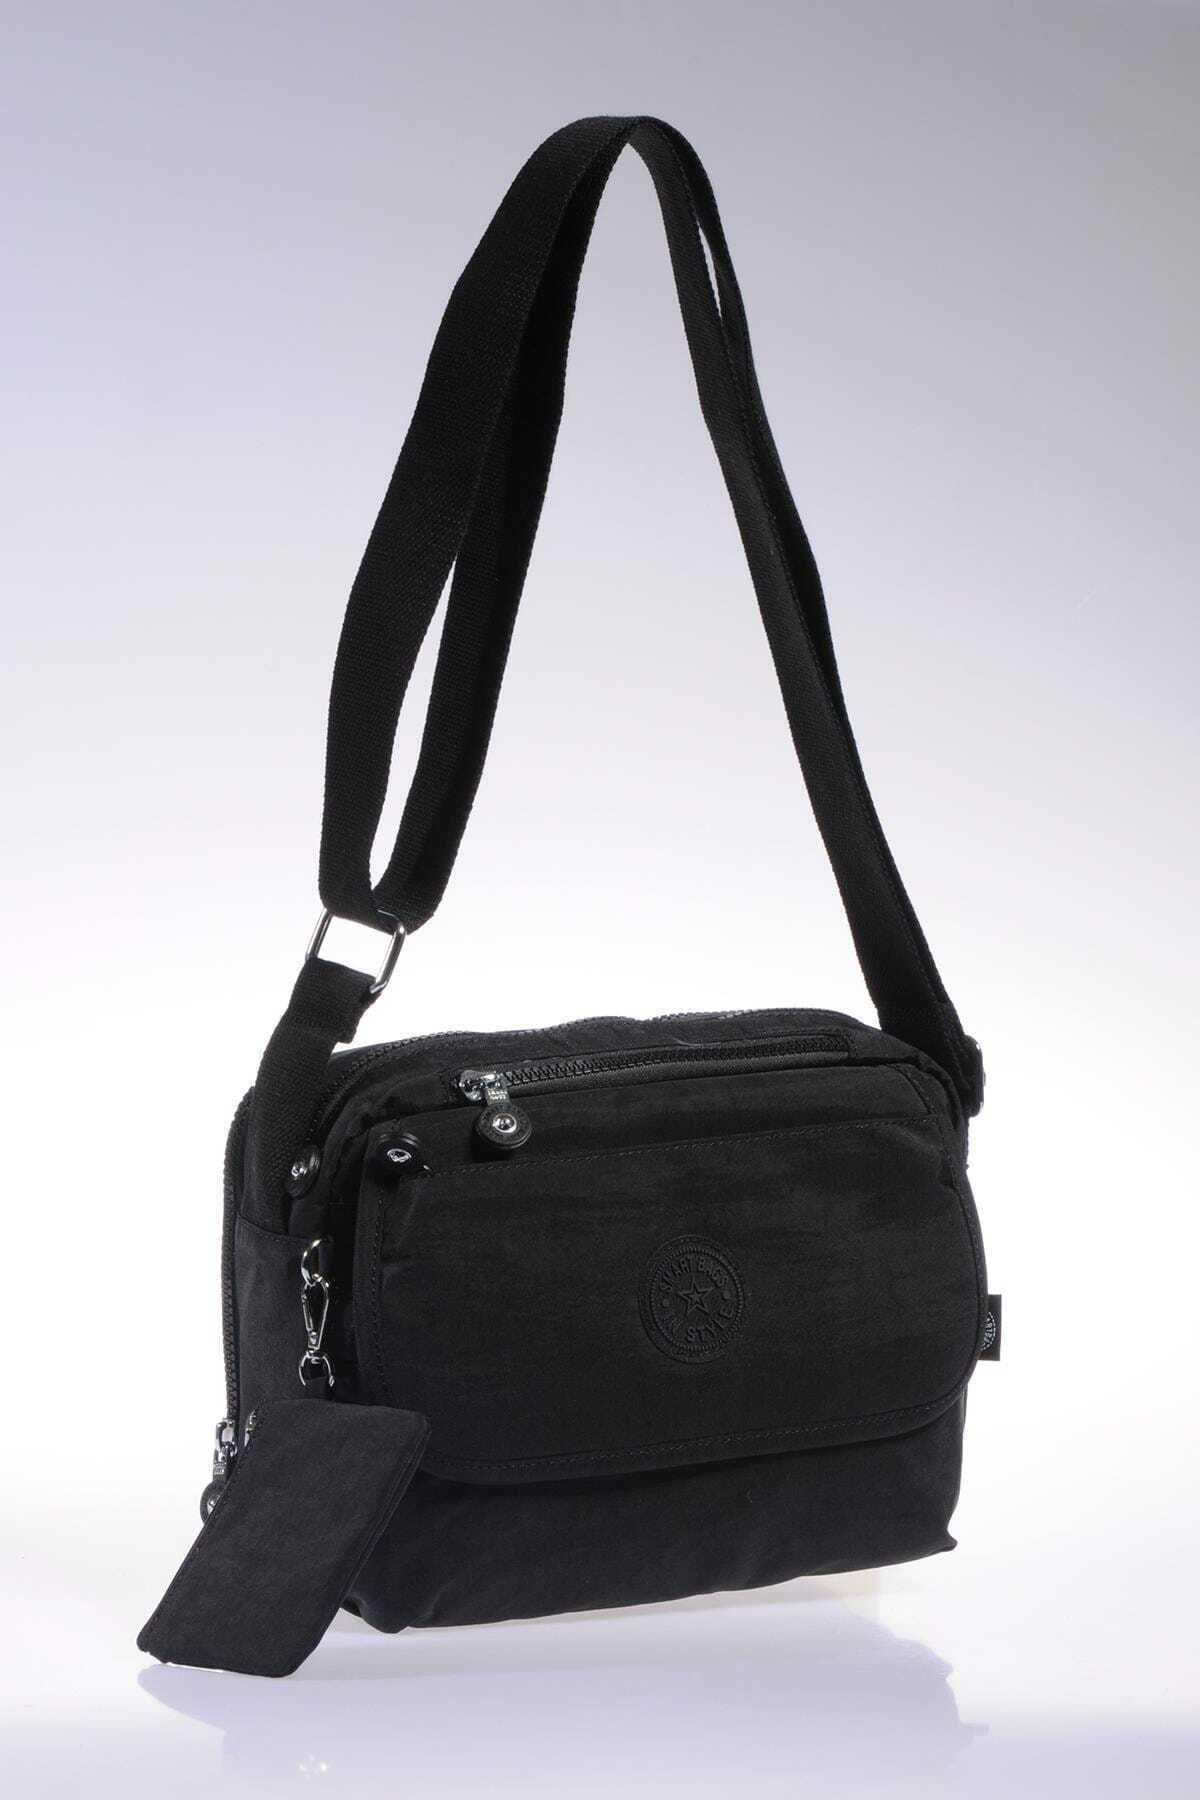 SMART BAGS Smb1172-0001 Siyah Kadın Çapraz Çanta 2